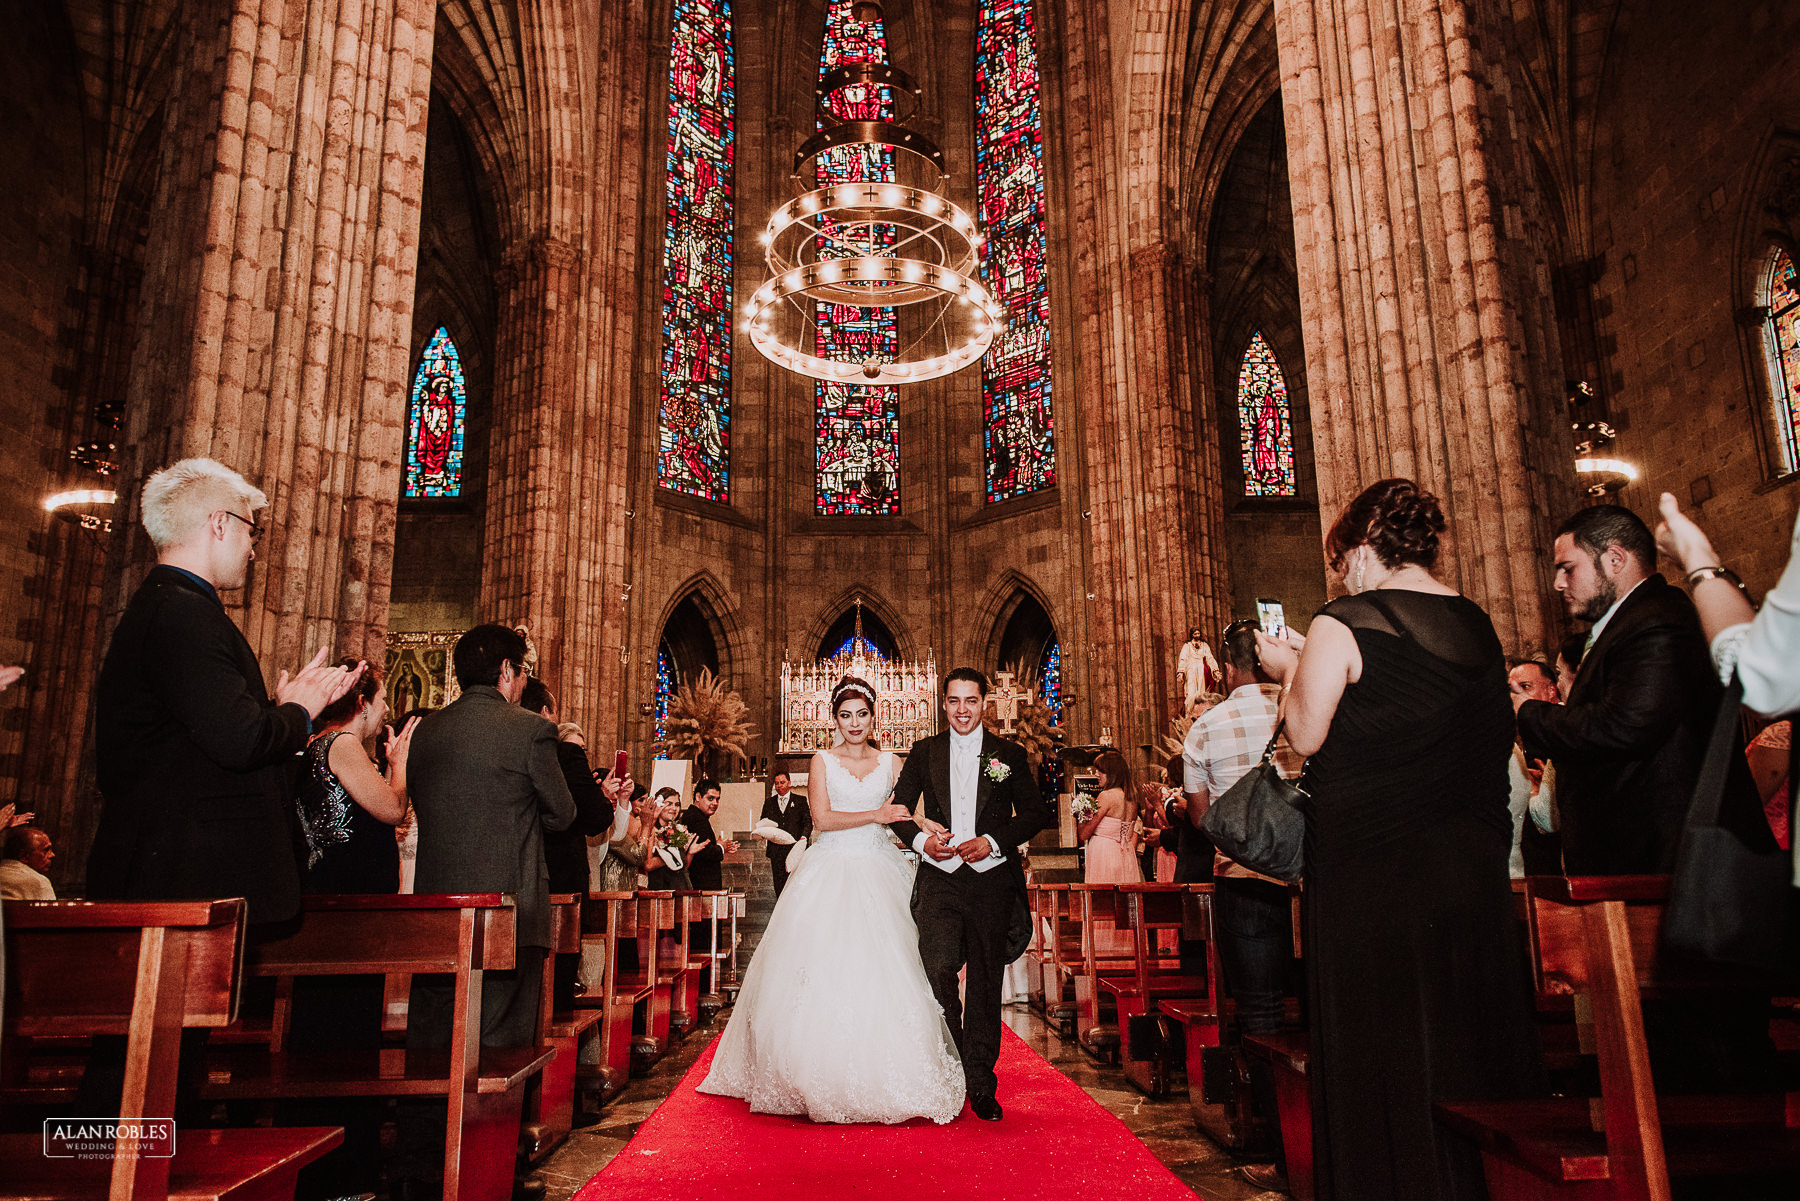 Alan Robles fotografo de bodas guadalajara - LyP Hotel Demetria-51